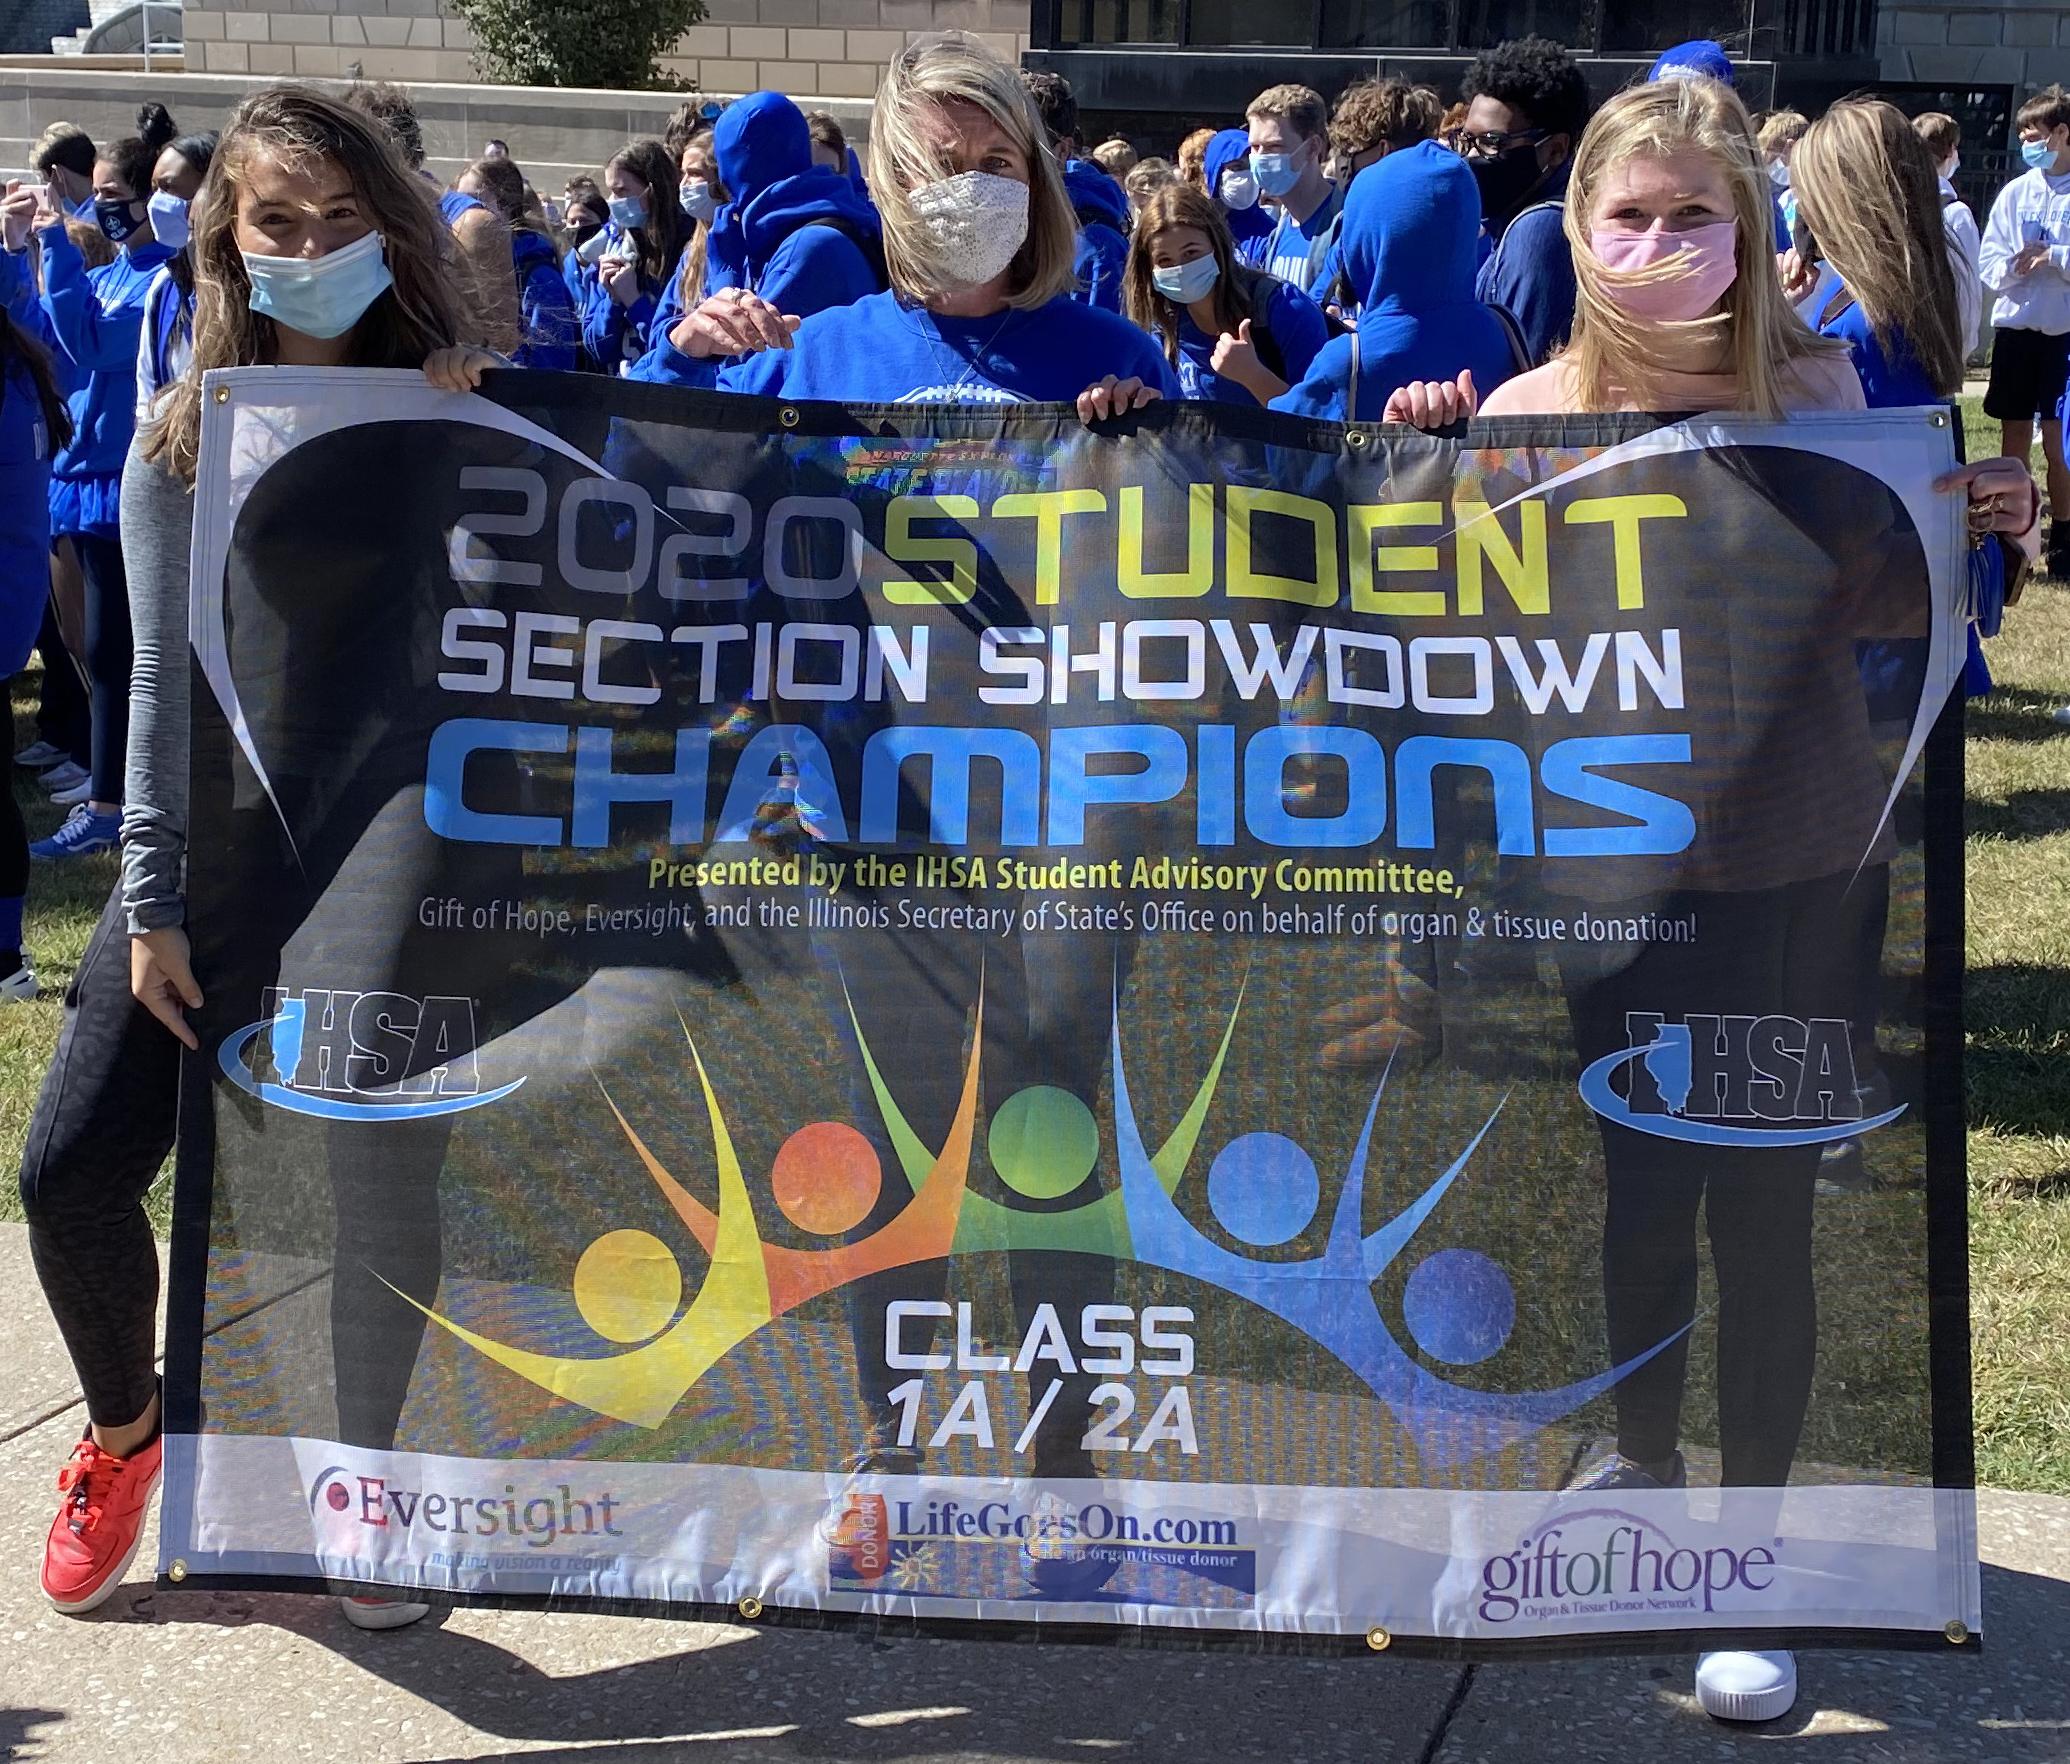 Alton Marquette Wins 2020 Ihsa Class 1a 2a Student Section Showdown